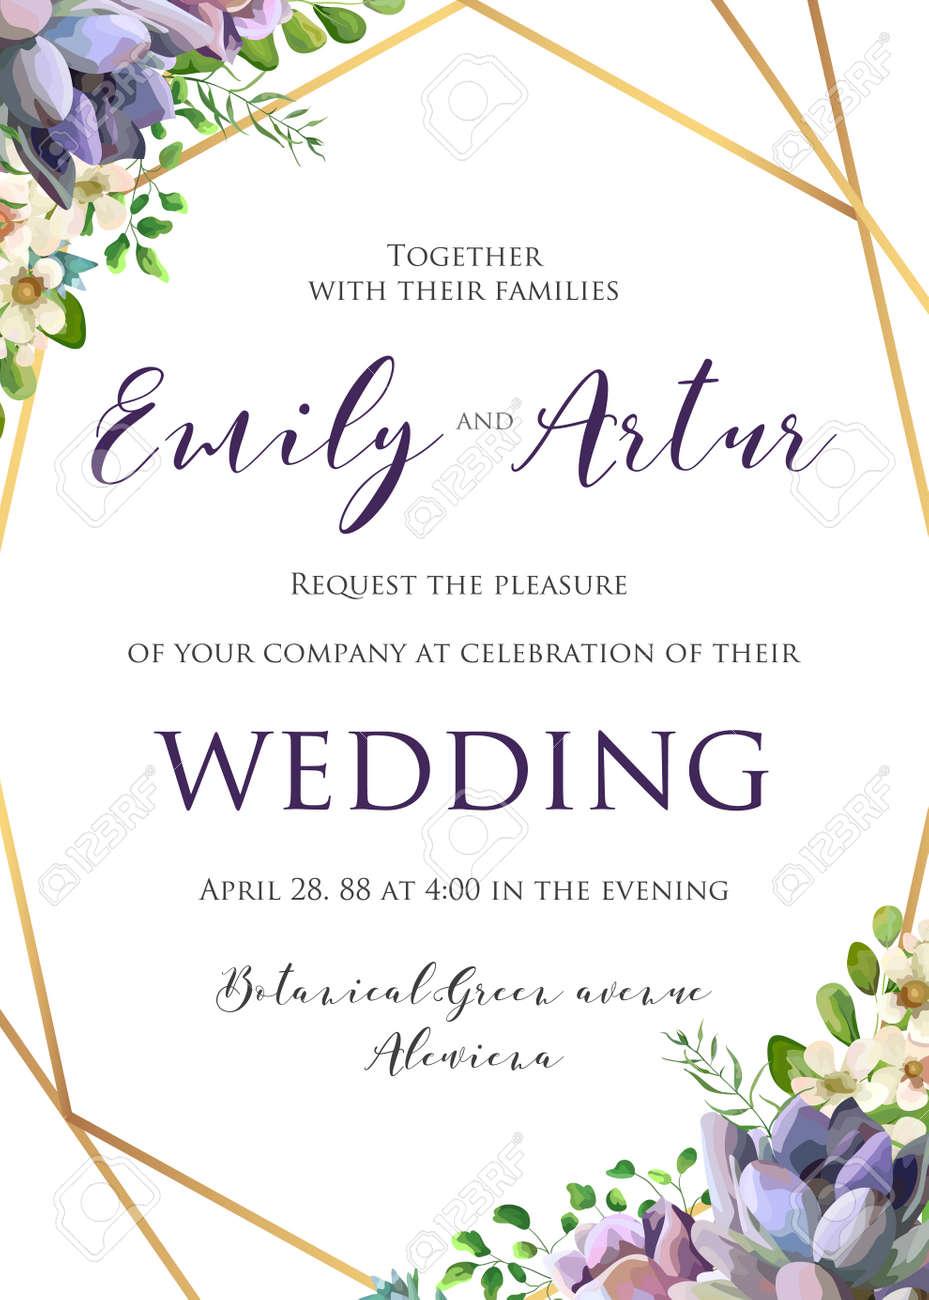 Wedding floral invitation, invite, save the date template. - 95558975